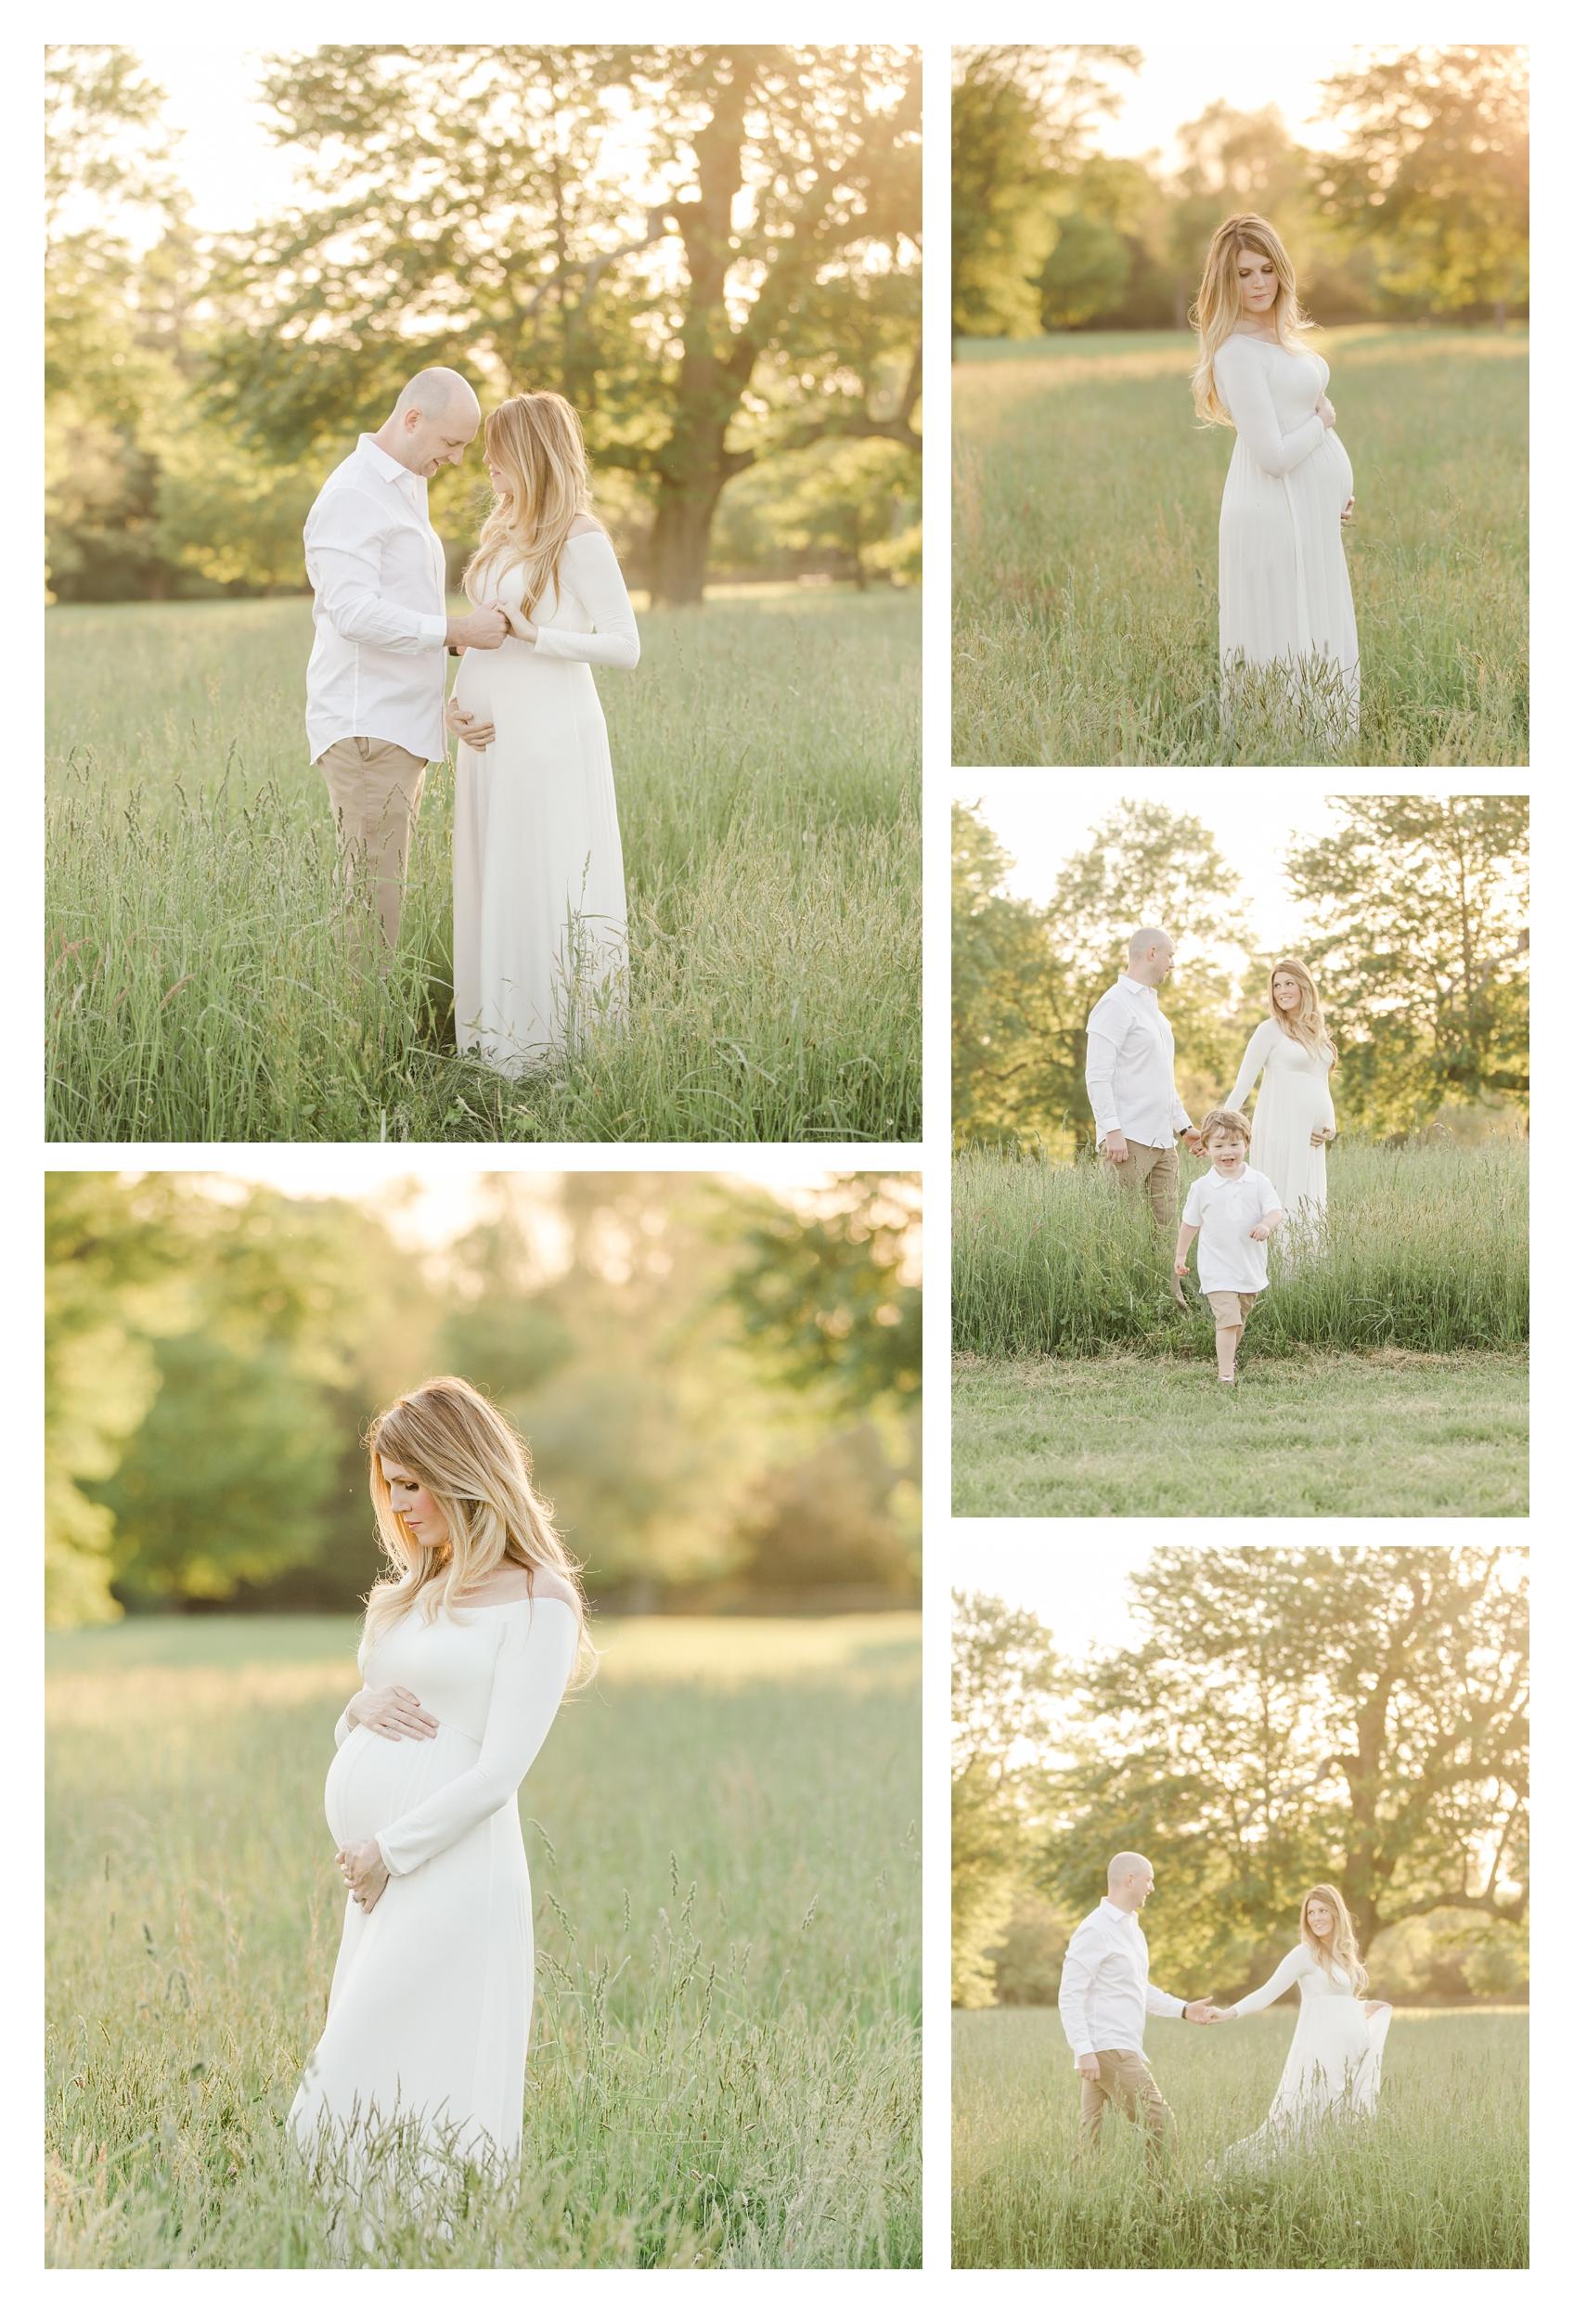 maternityphotographerfairfieldcountyct-wavenyparkfieldsession-kristinwoodphotography.jpg